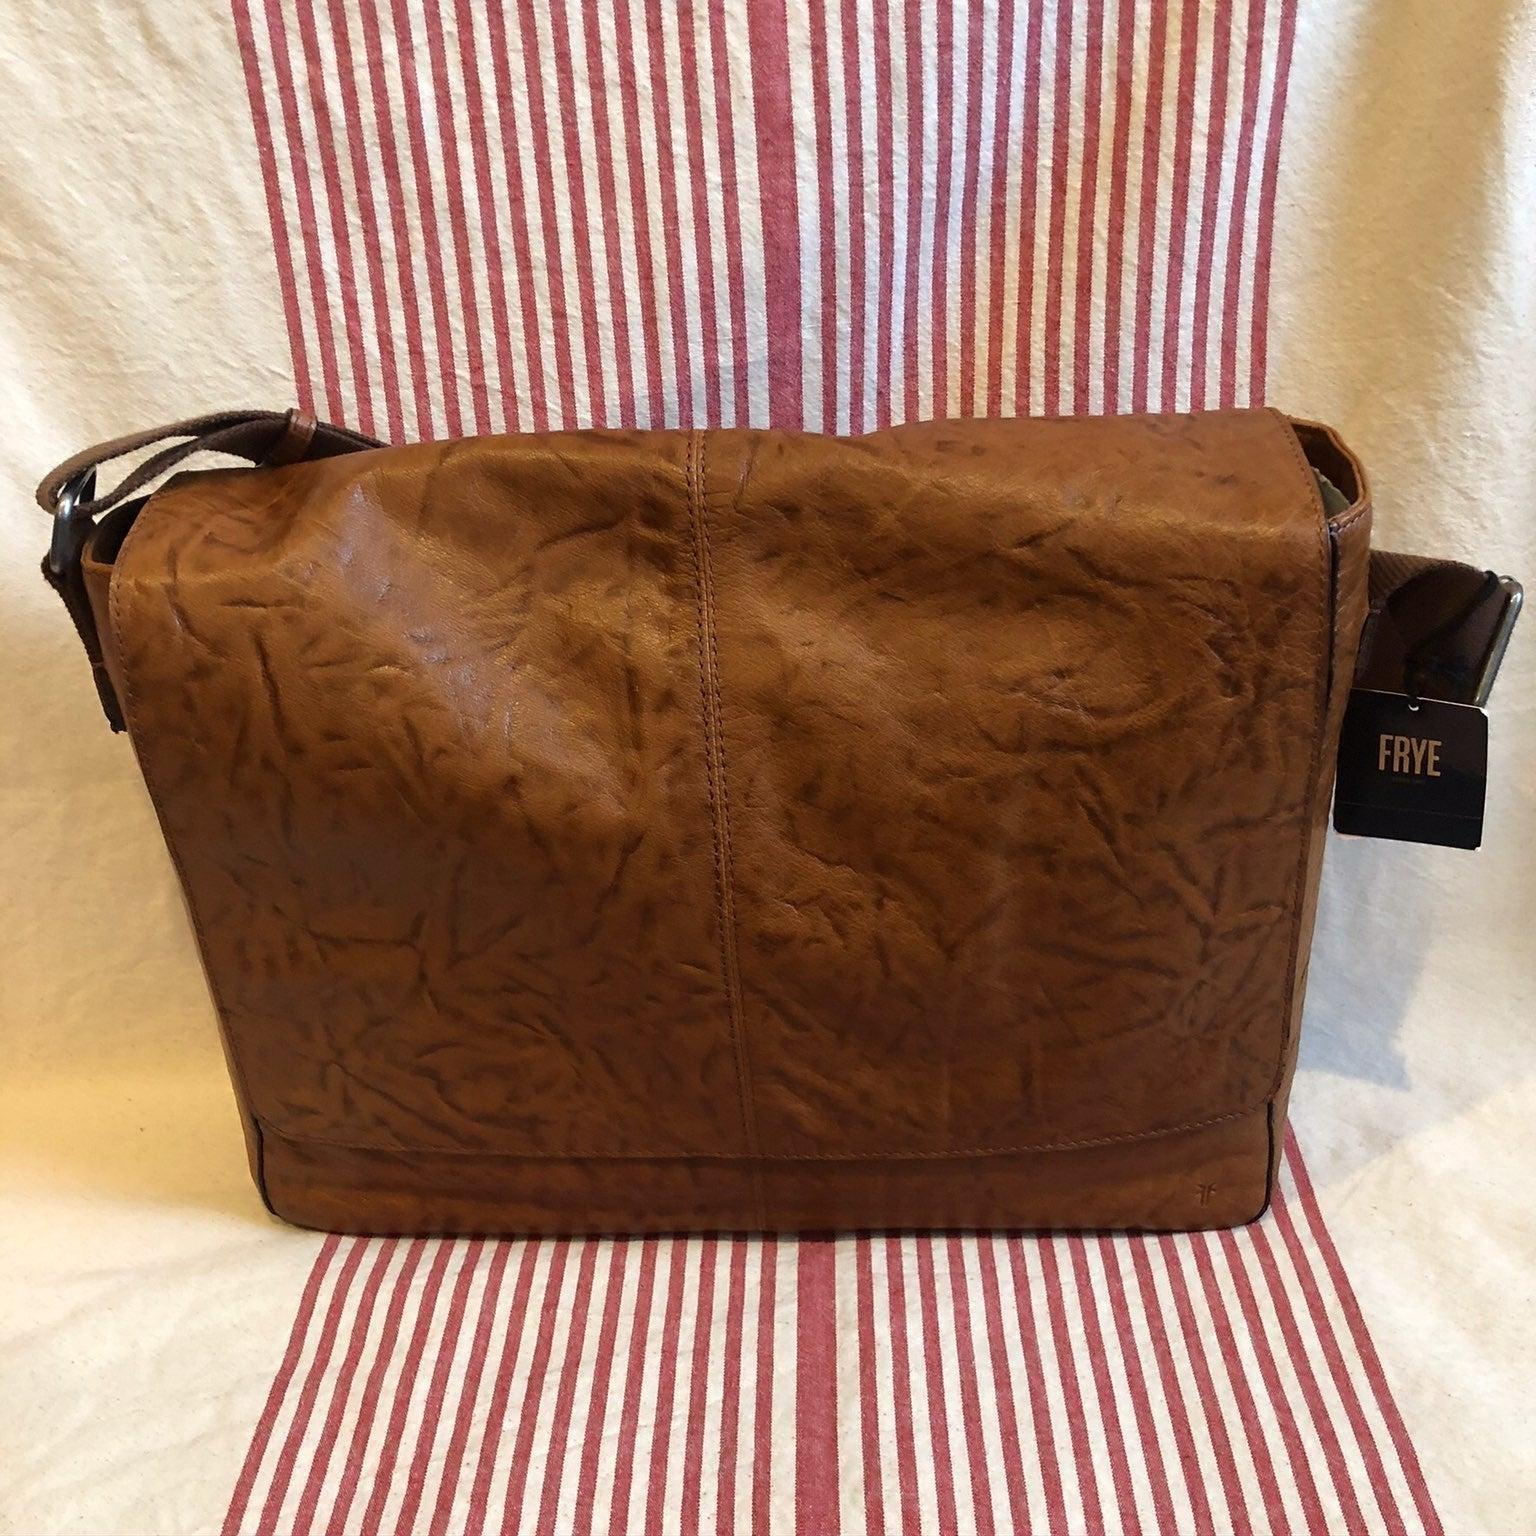 Brand New FRYE Leather Messenger Bag NWT